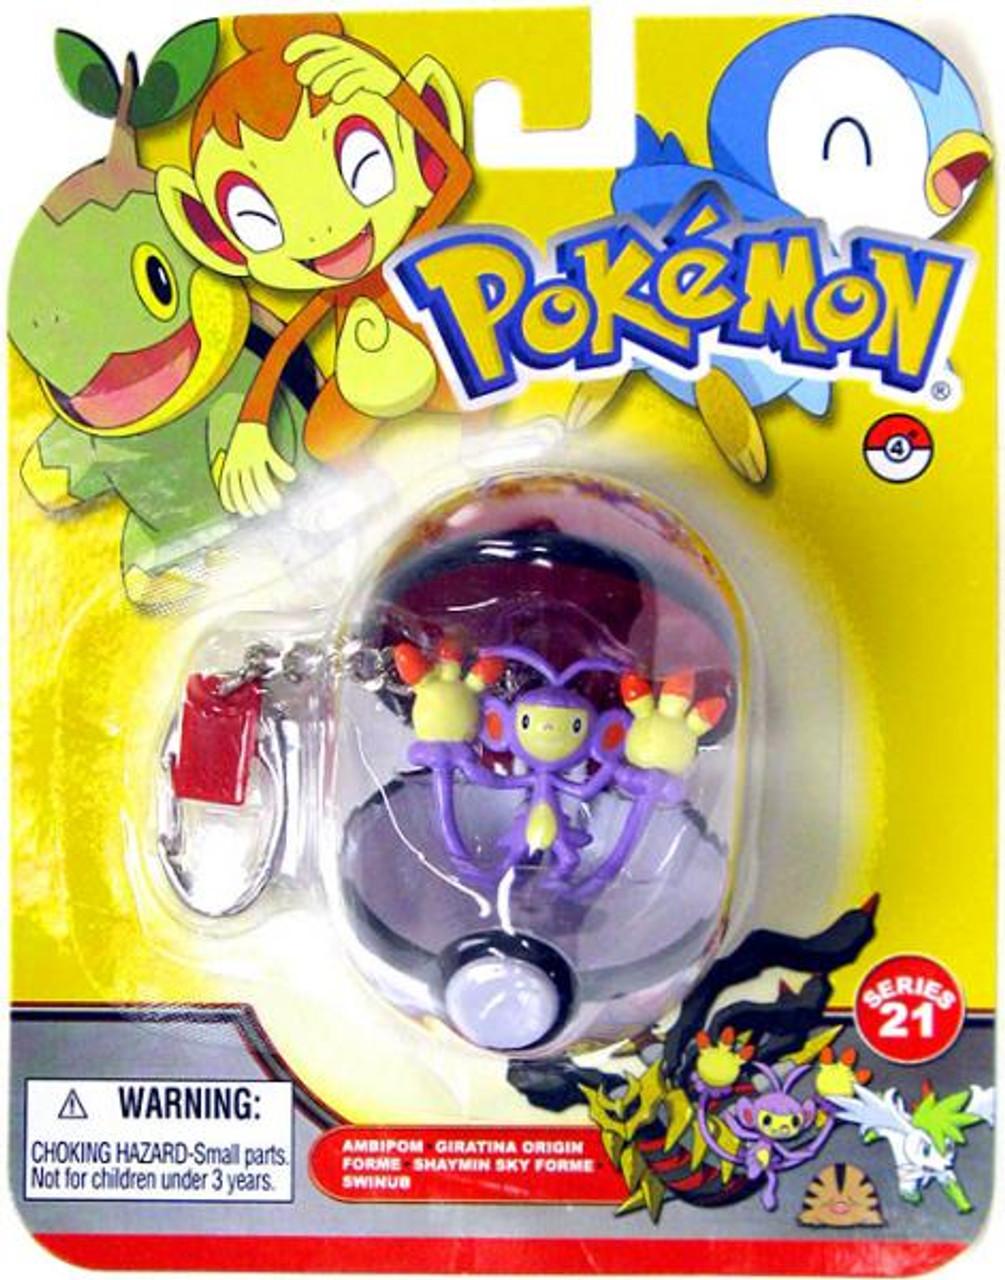 Pokemon Diamond & Pearl Series 21 Ambipom Keychain